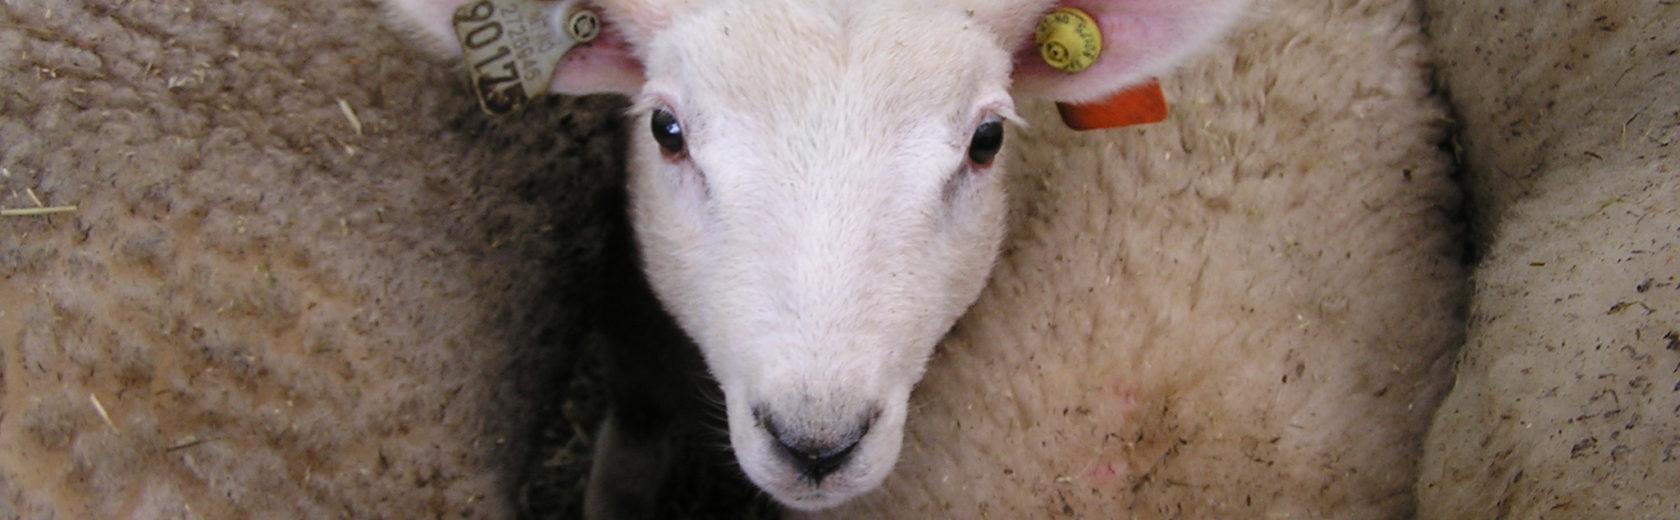 mouton agneau